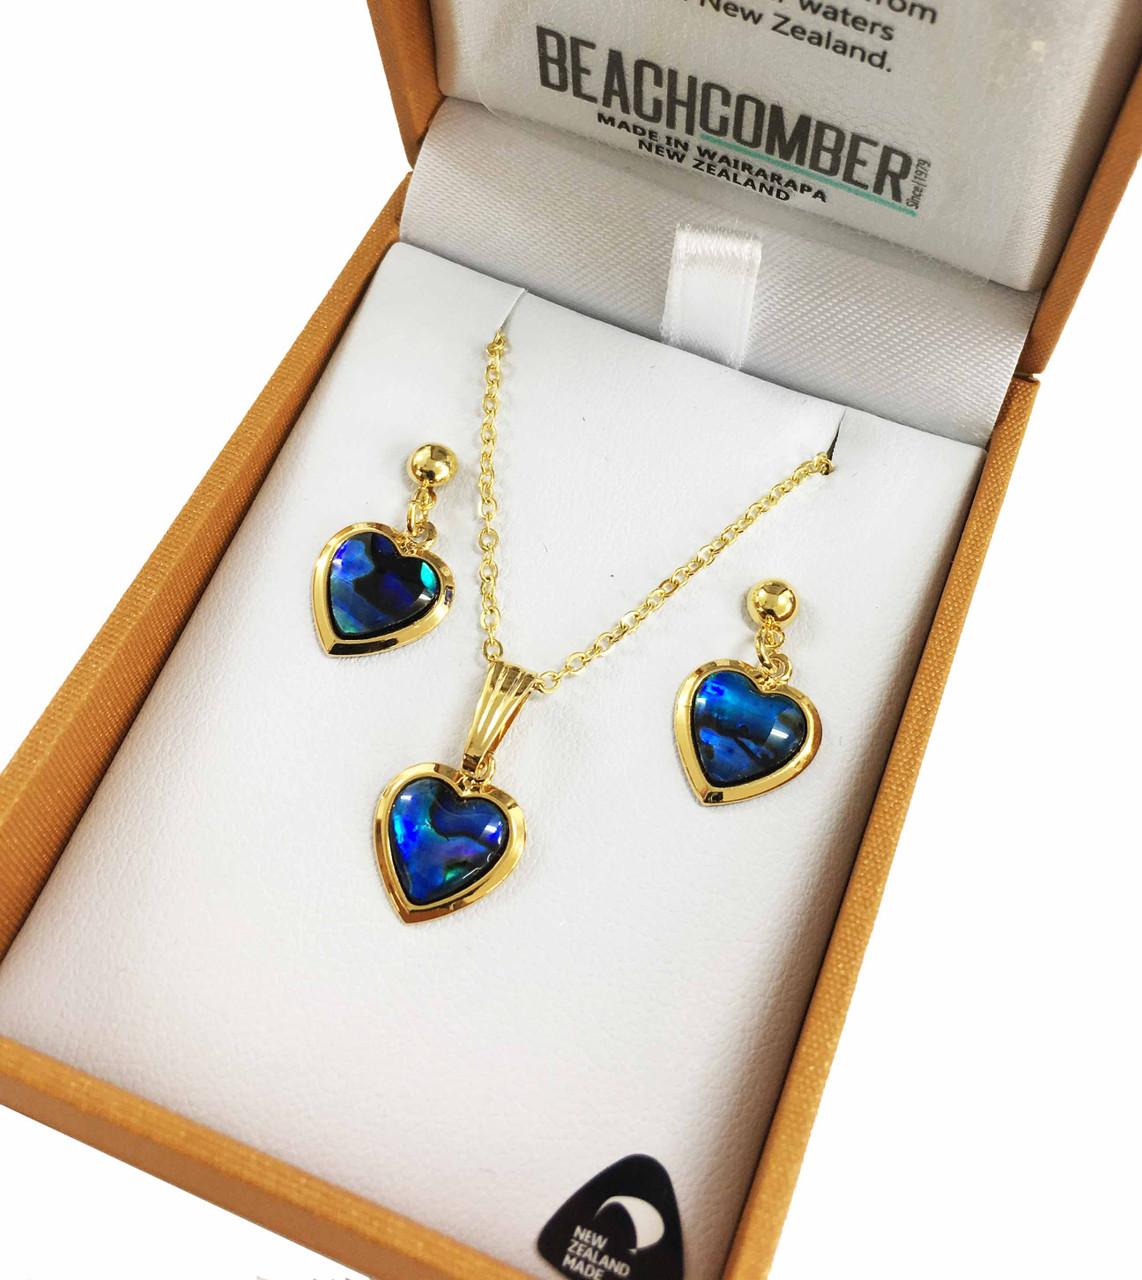 BBJ1119S Paua Love Heart Pendant and Earrings Set Gold Plated Boxed